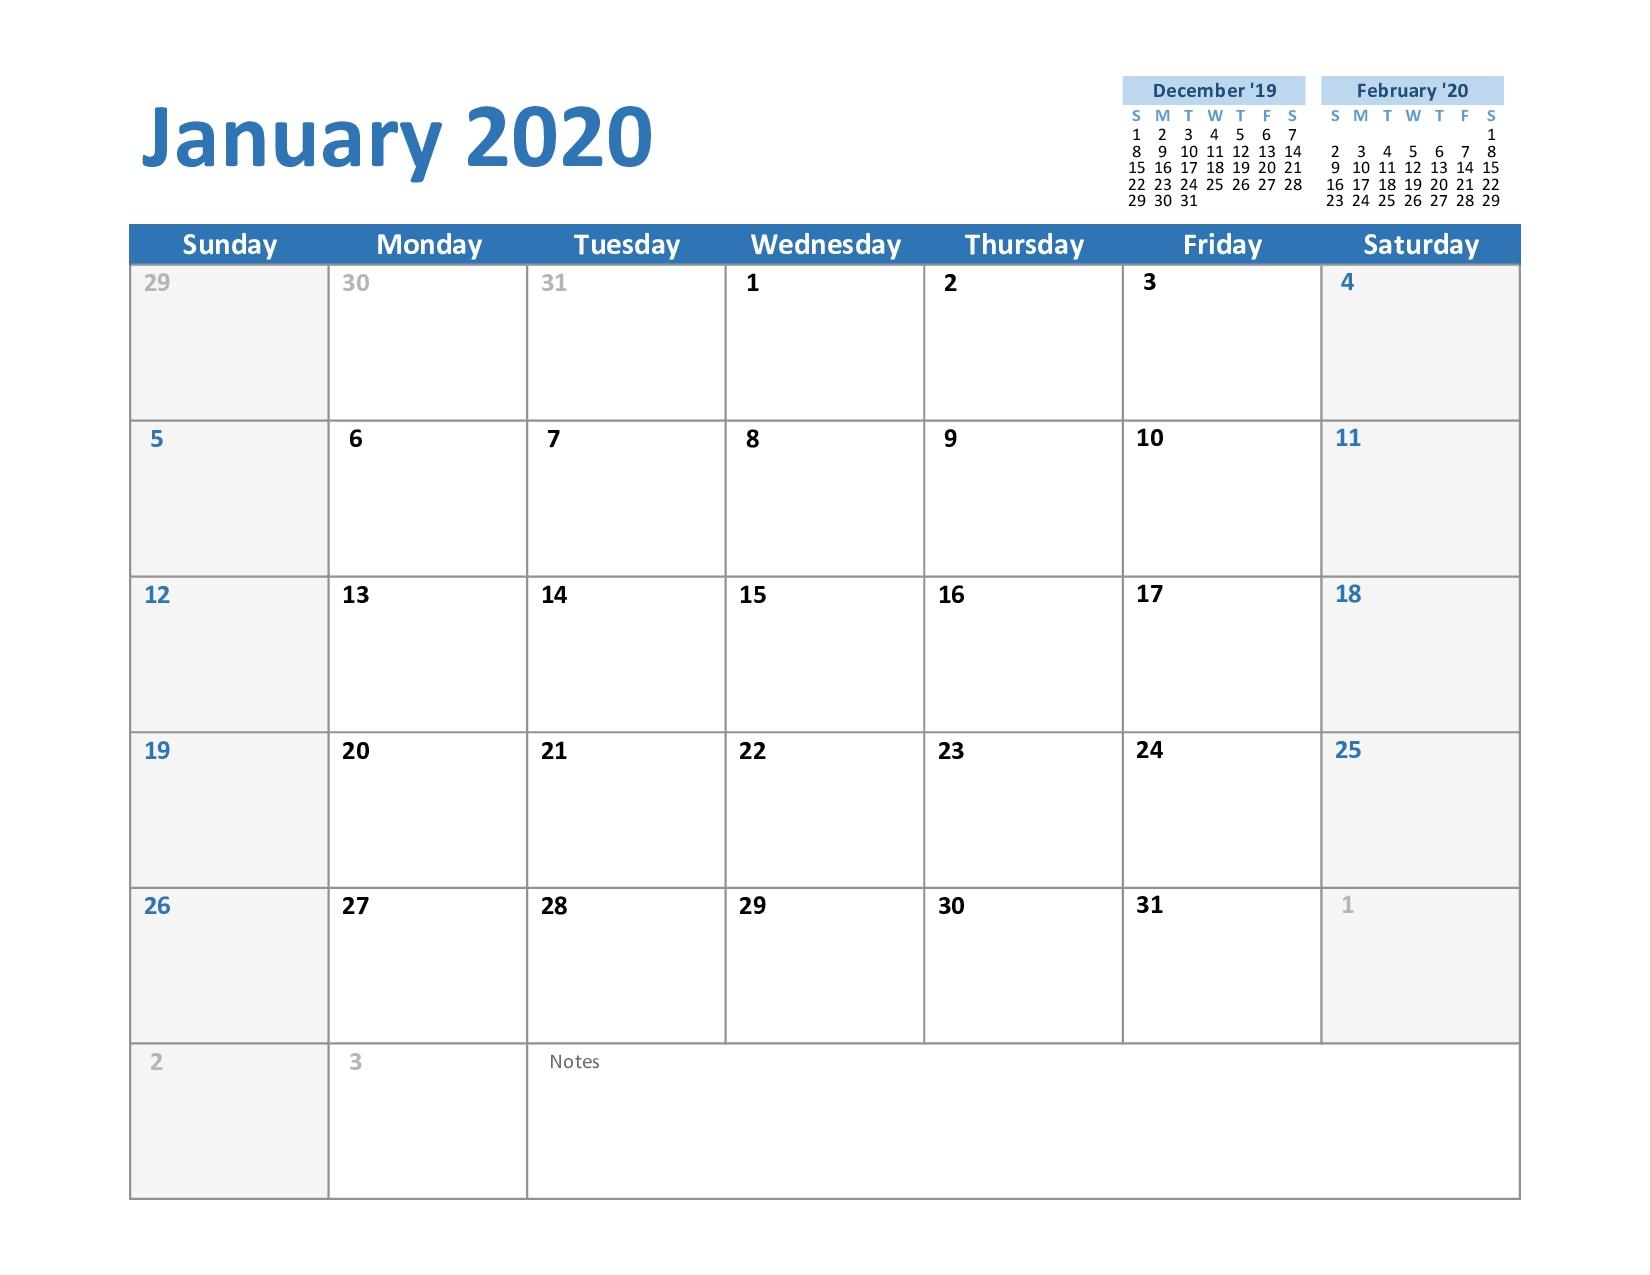 Printable January 2020 Calendar - Free Blank Templates-January 2020 School Calendar